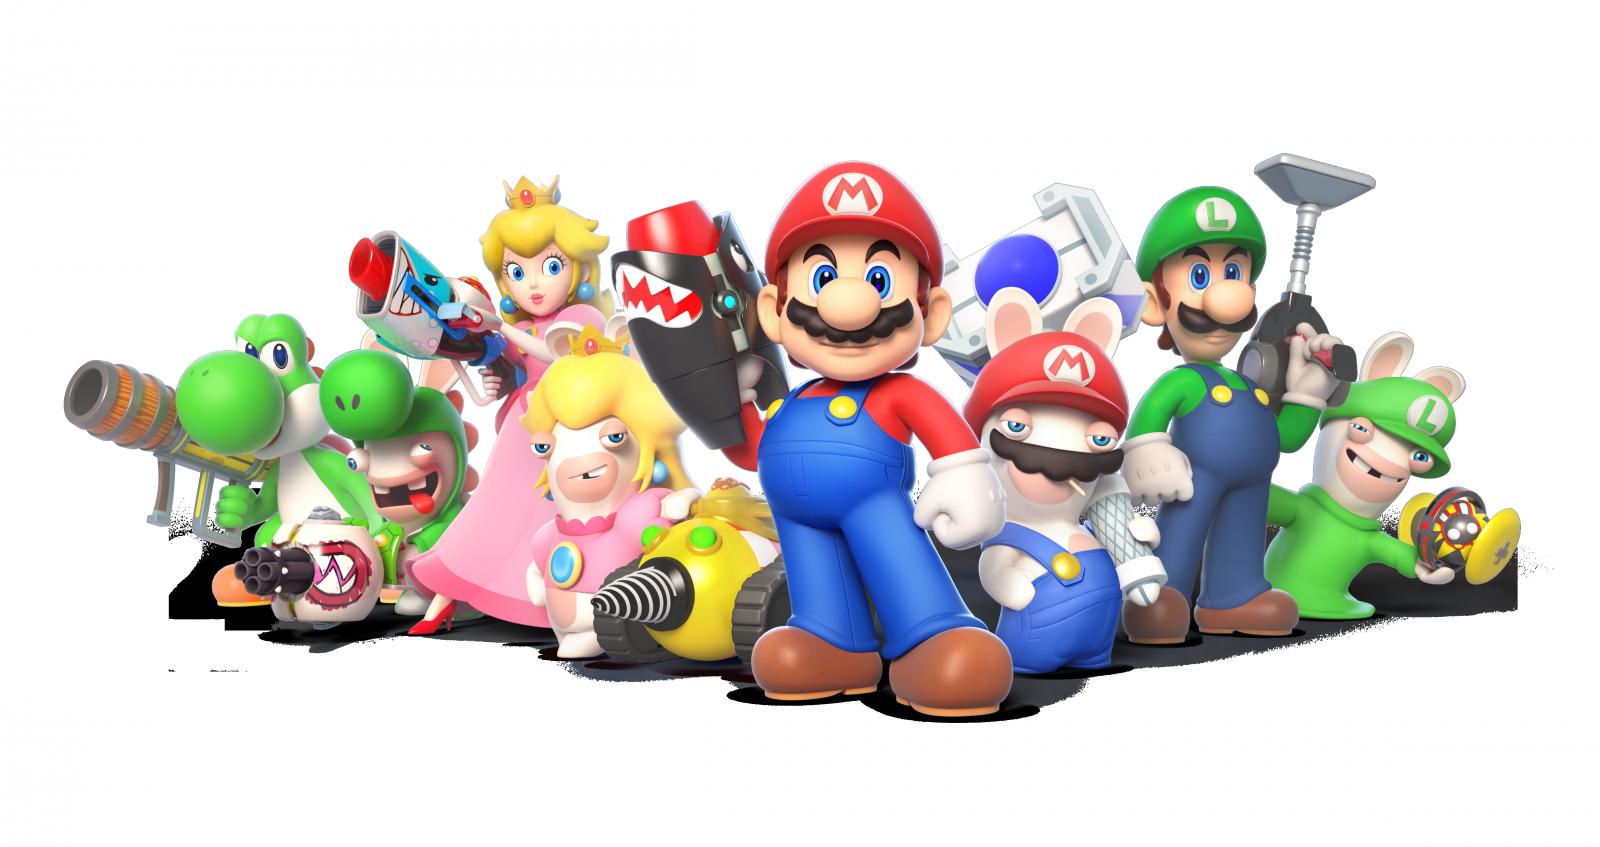 Mario   Rabbids: Kingdom Battle characters